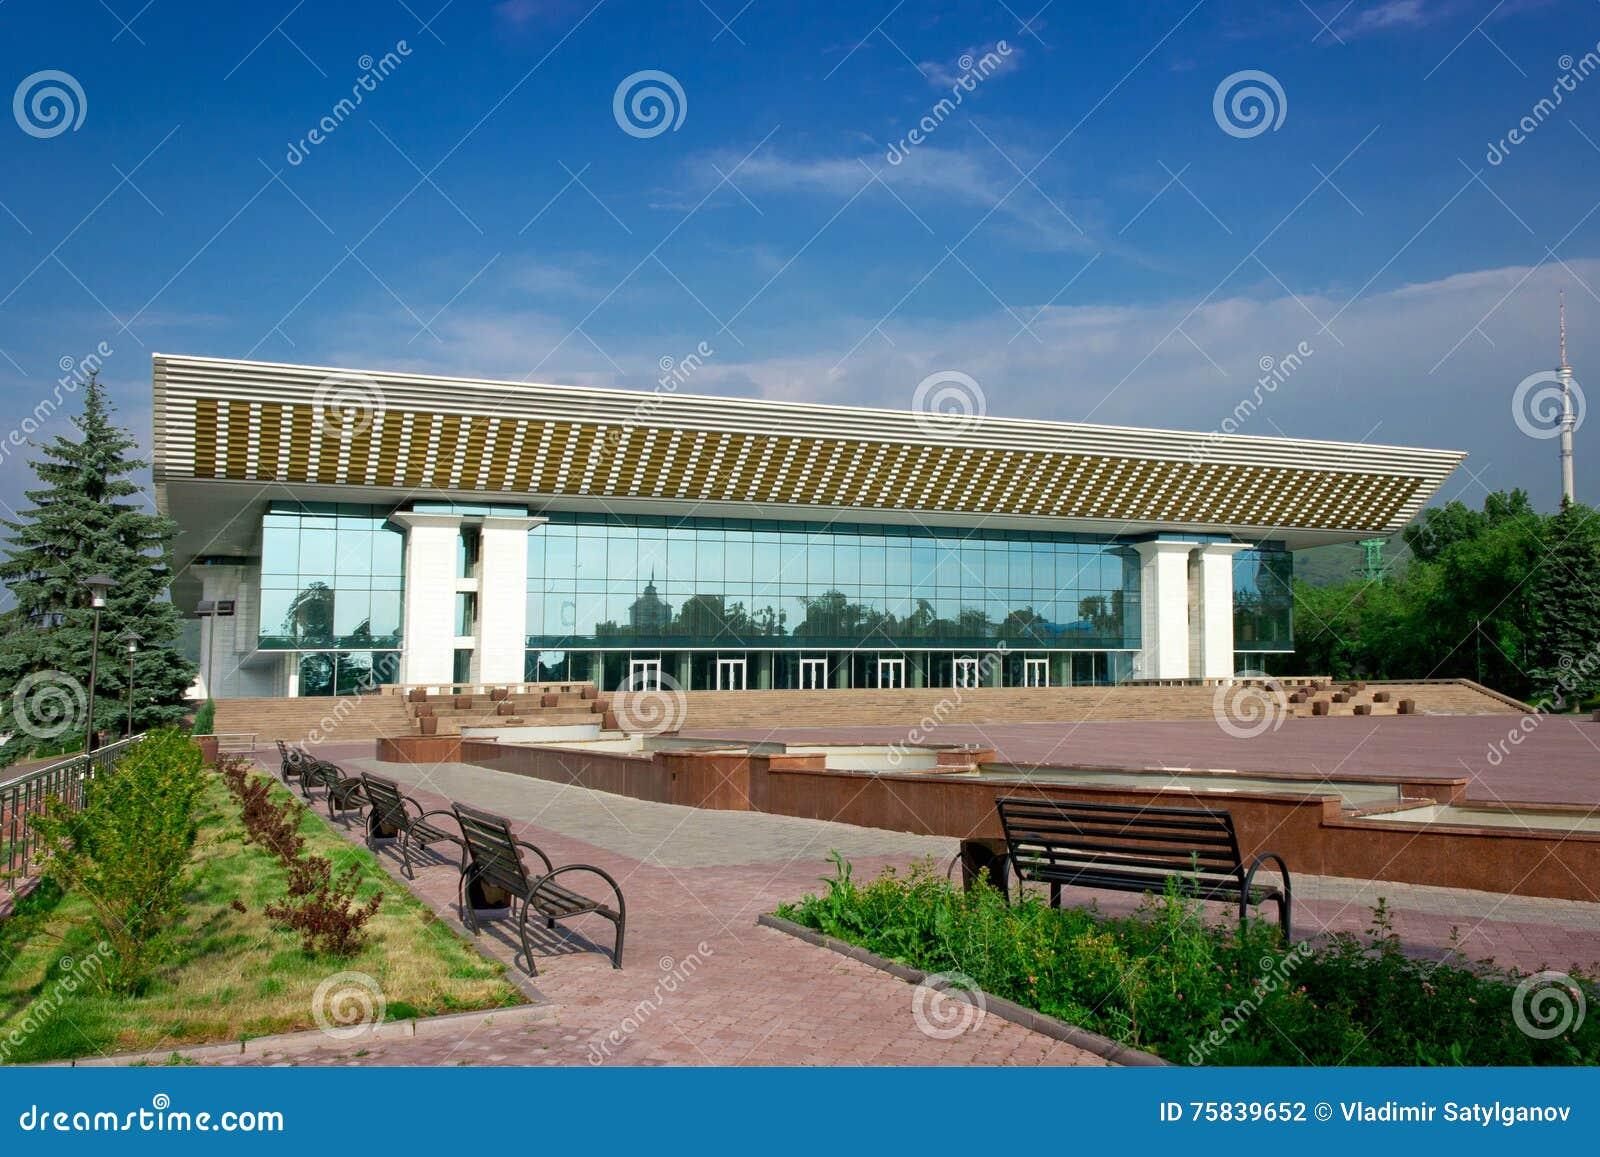 Дворец республики, Алма-Ата